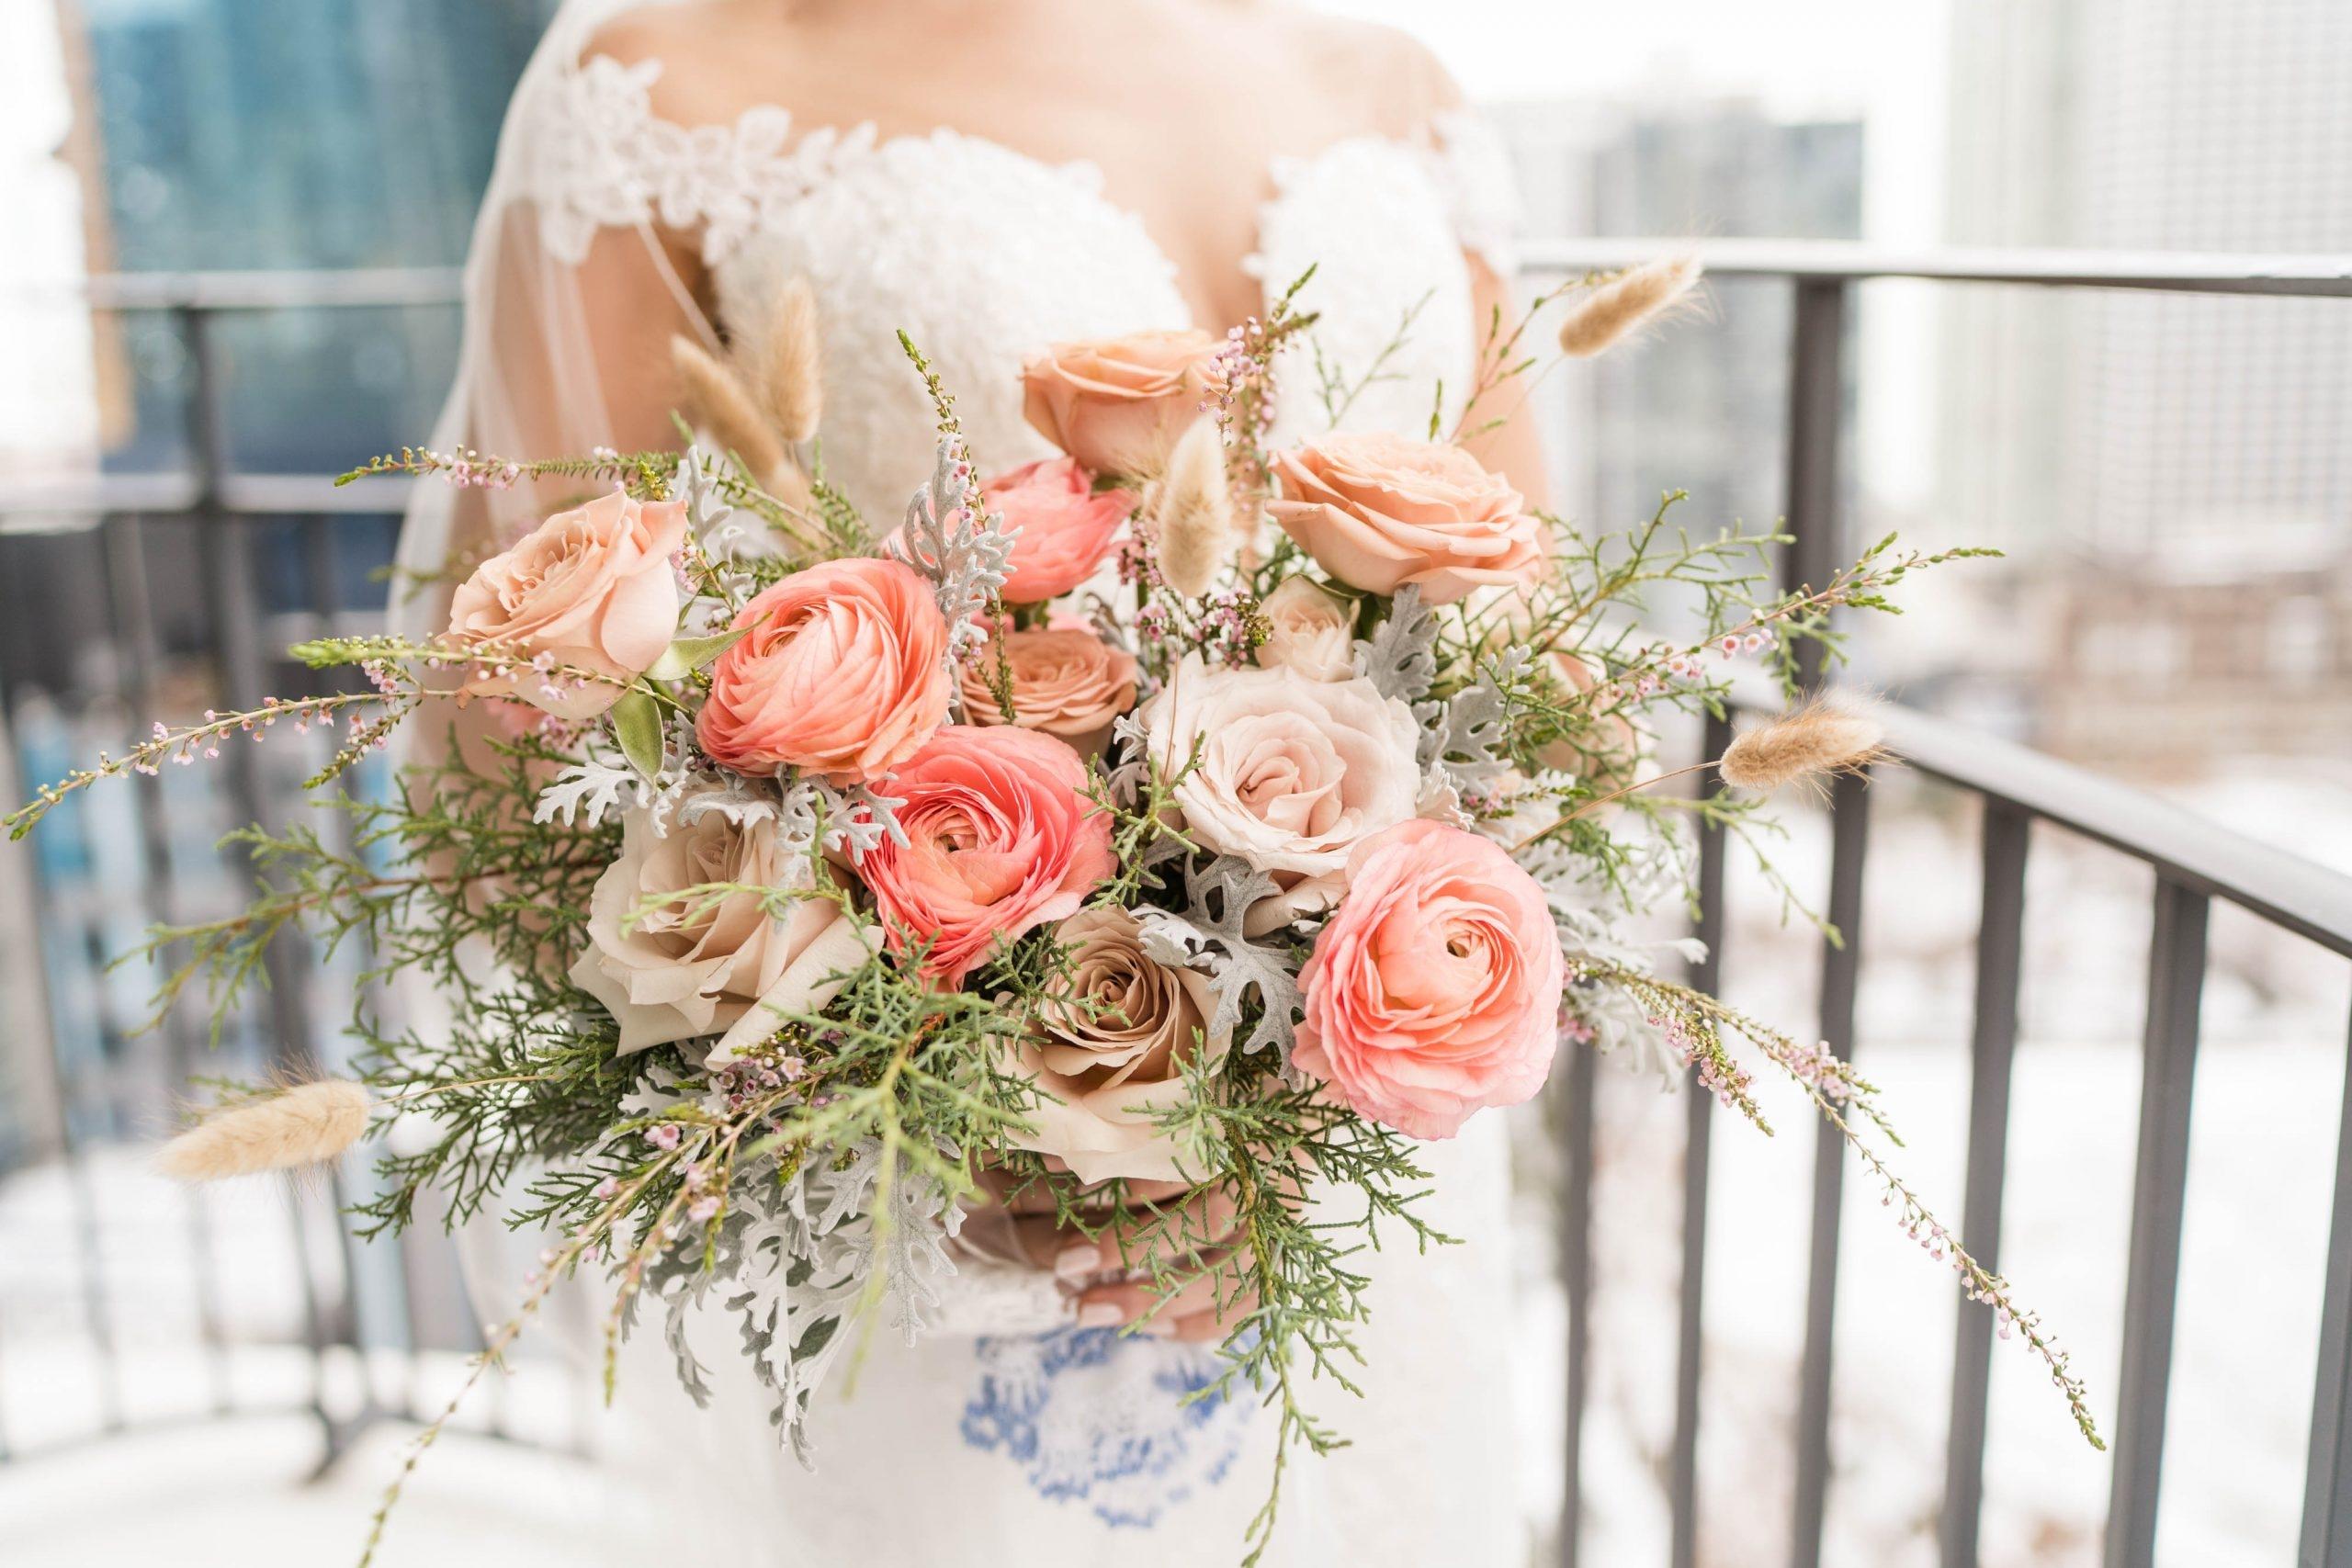 Romantic Winter Wedding Bridal Bouquet